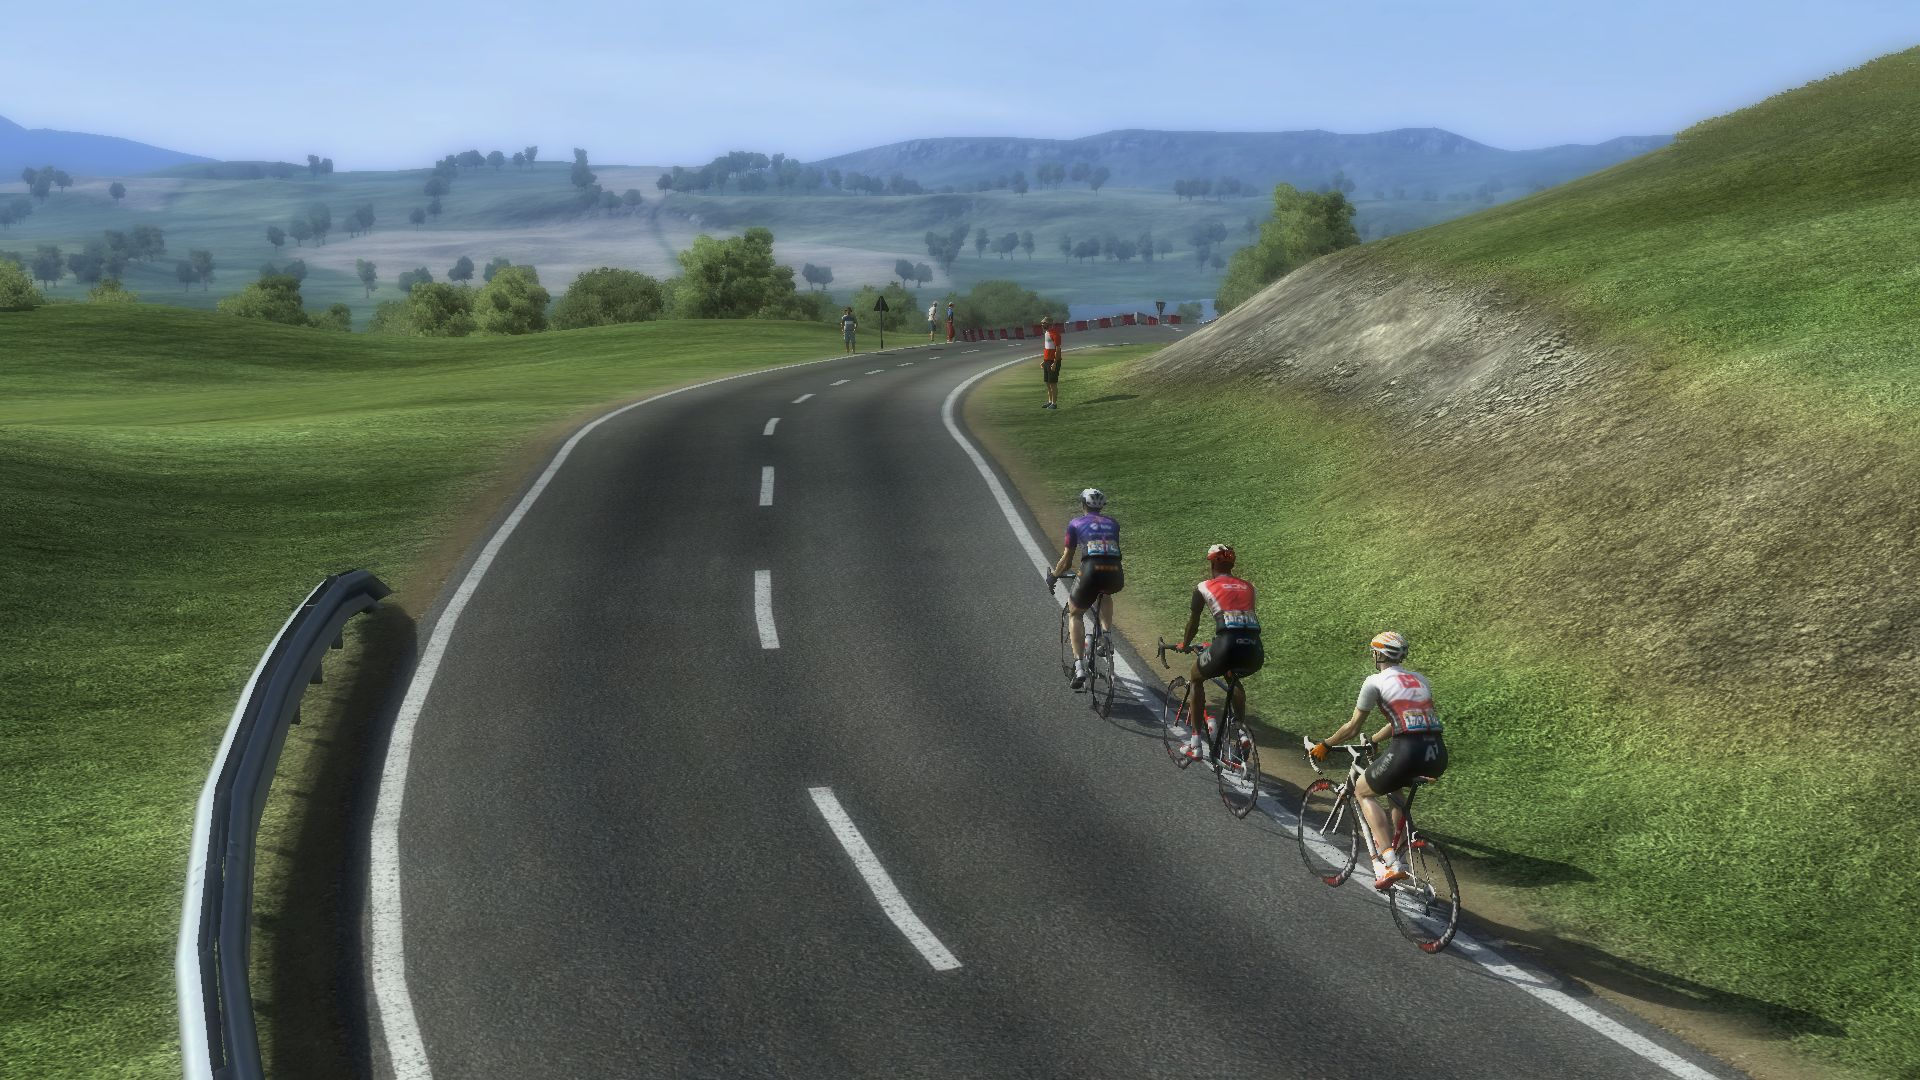 pcmdaily.com/images/mg/2018/Races/C2HC/Zuri/Zuri%203.jpg